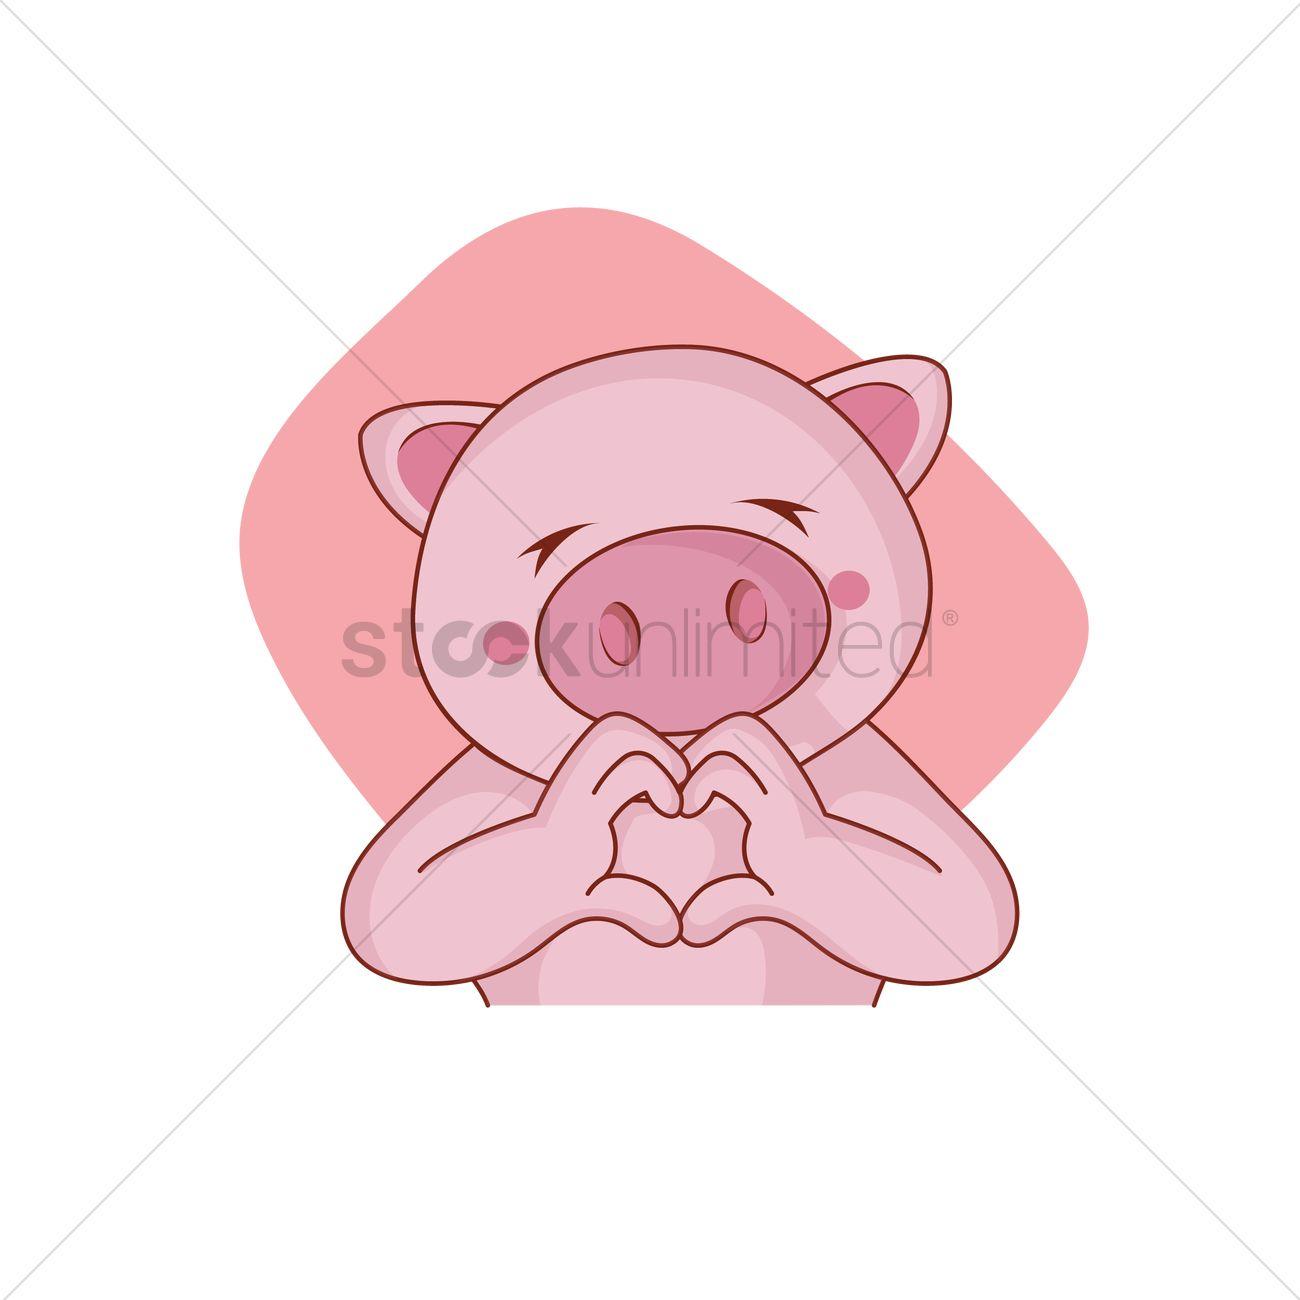 Cartoon Pig Hand Gesturing A Heart Shape Vector Graphic